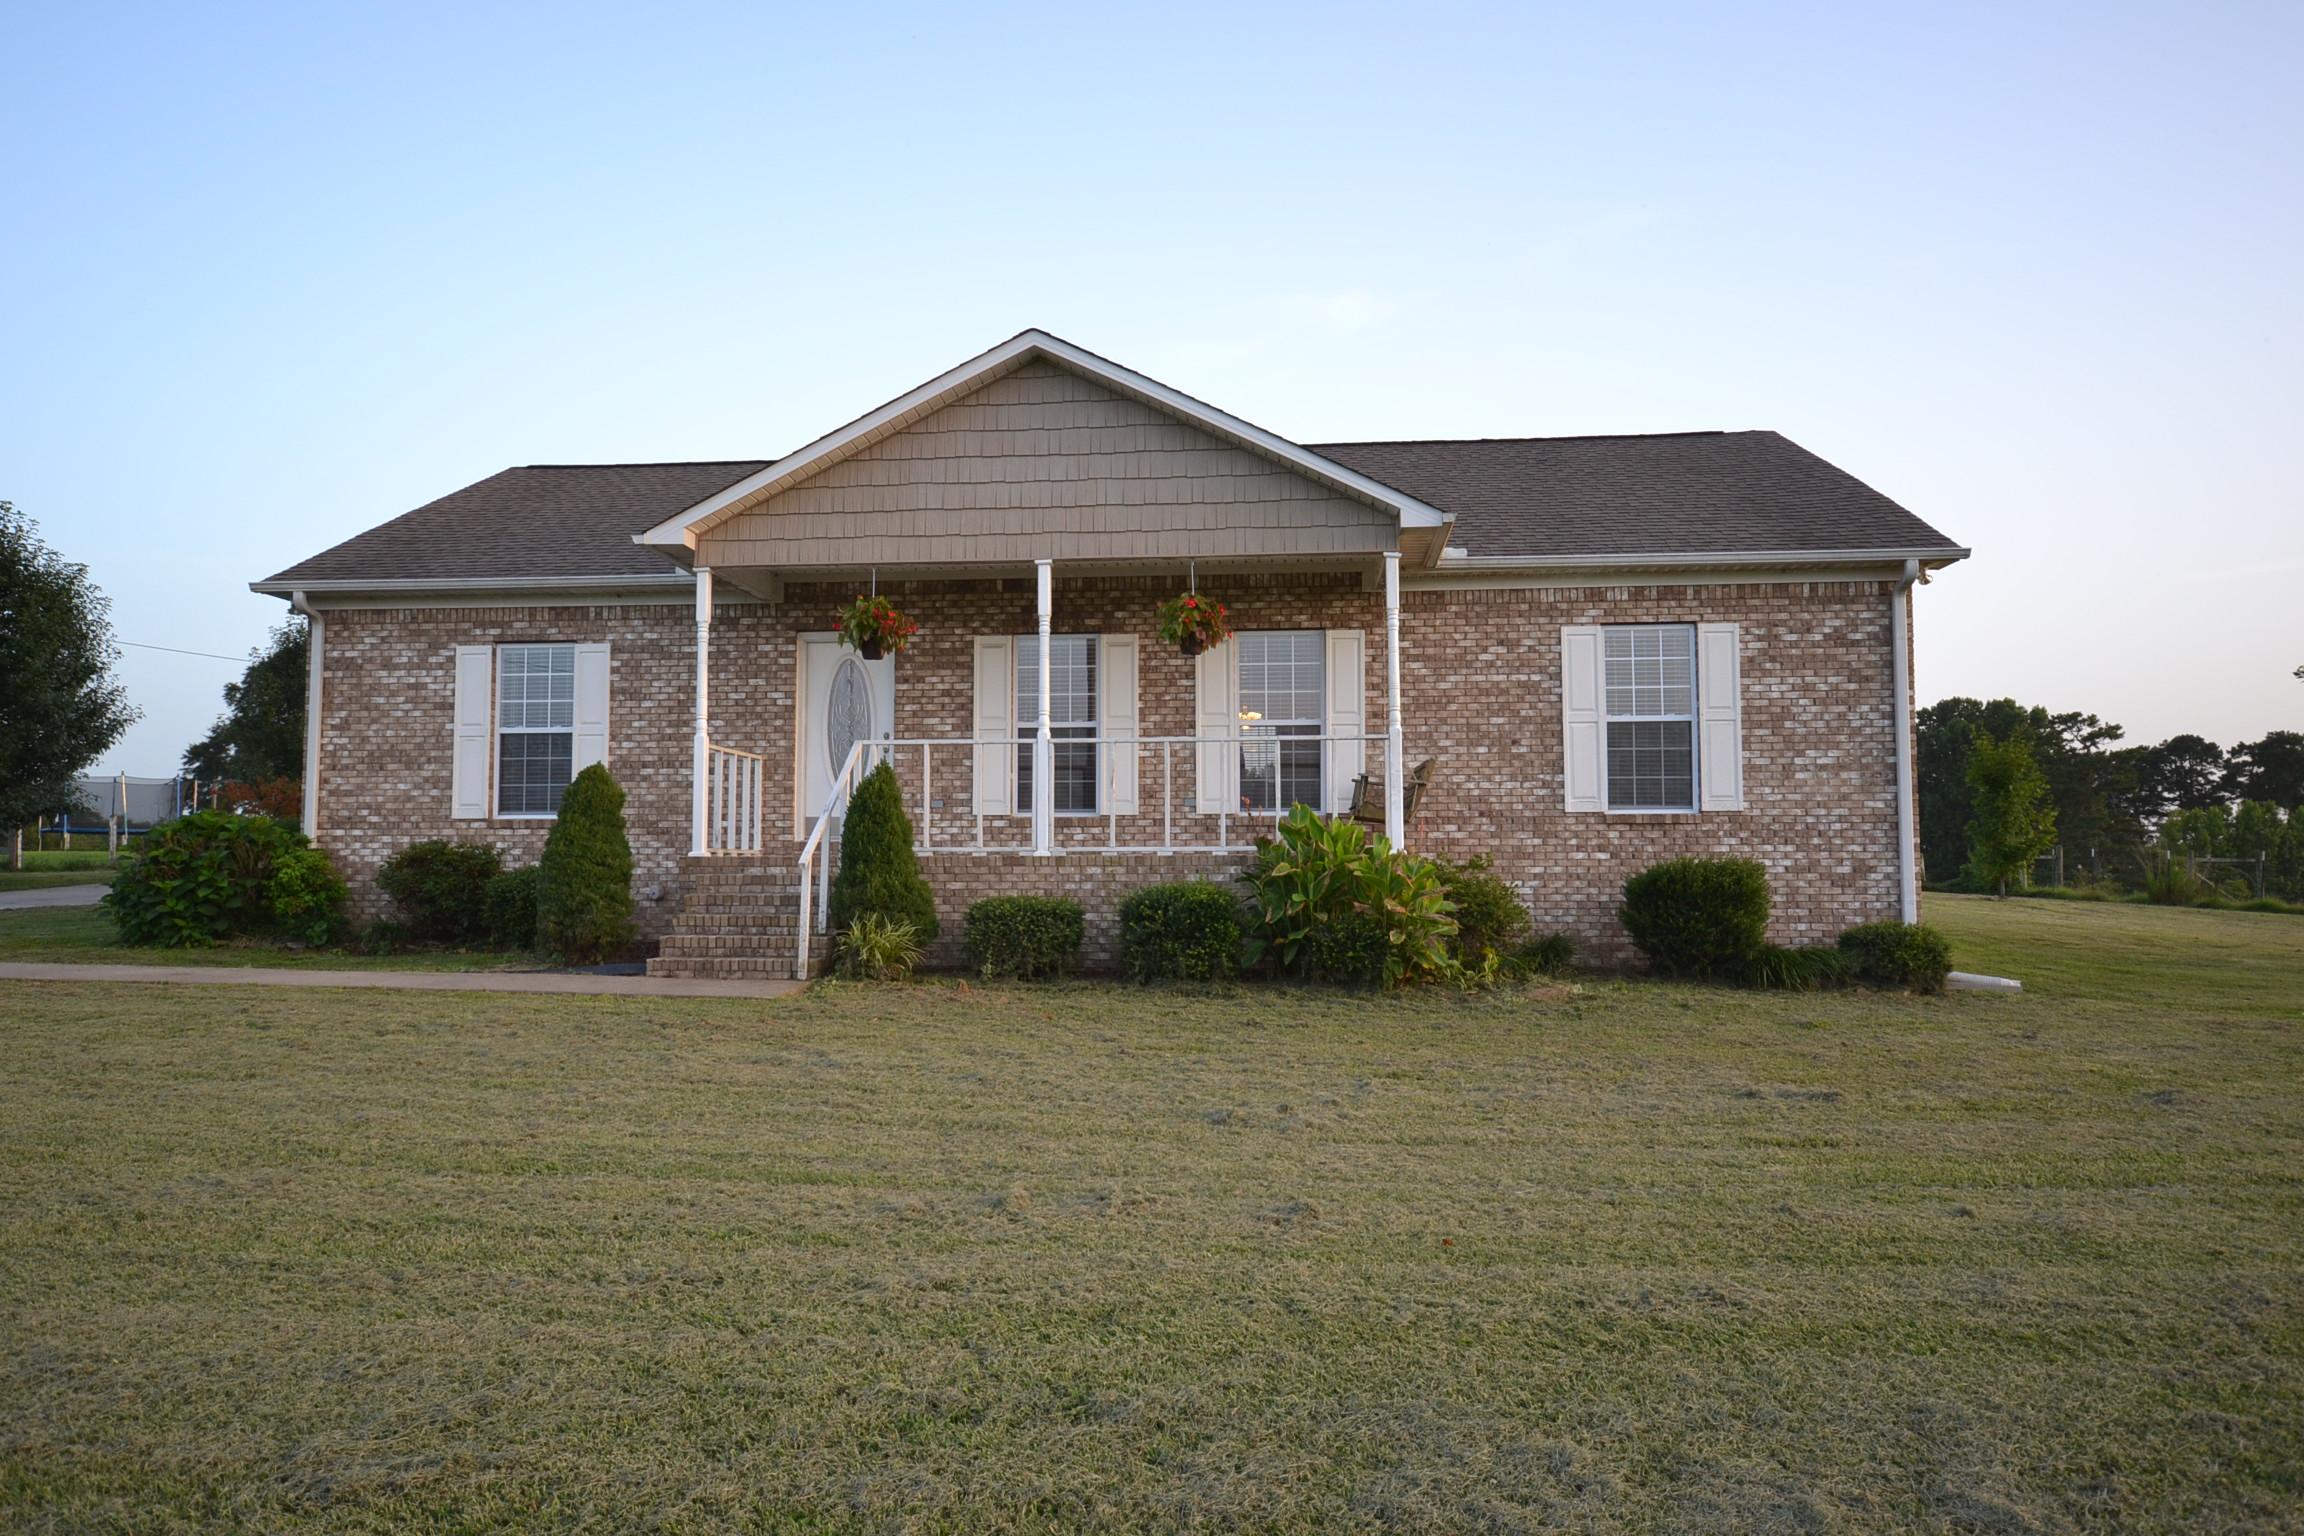 322 Mardis Pt Rd, Joppa, Alabama 35087